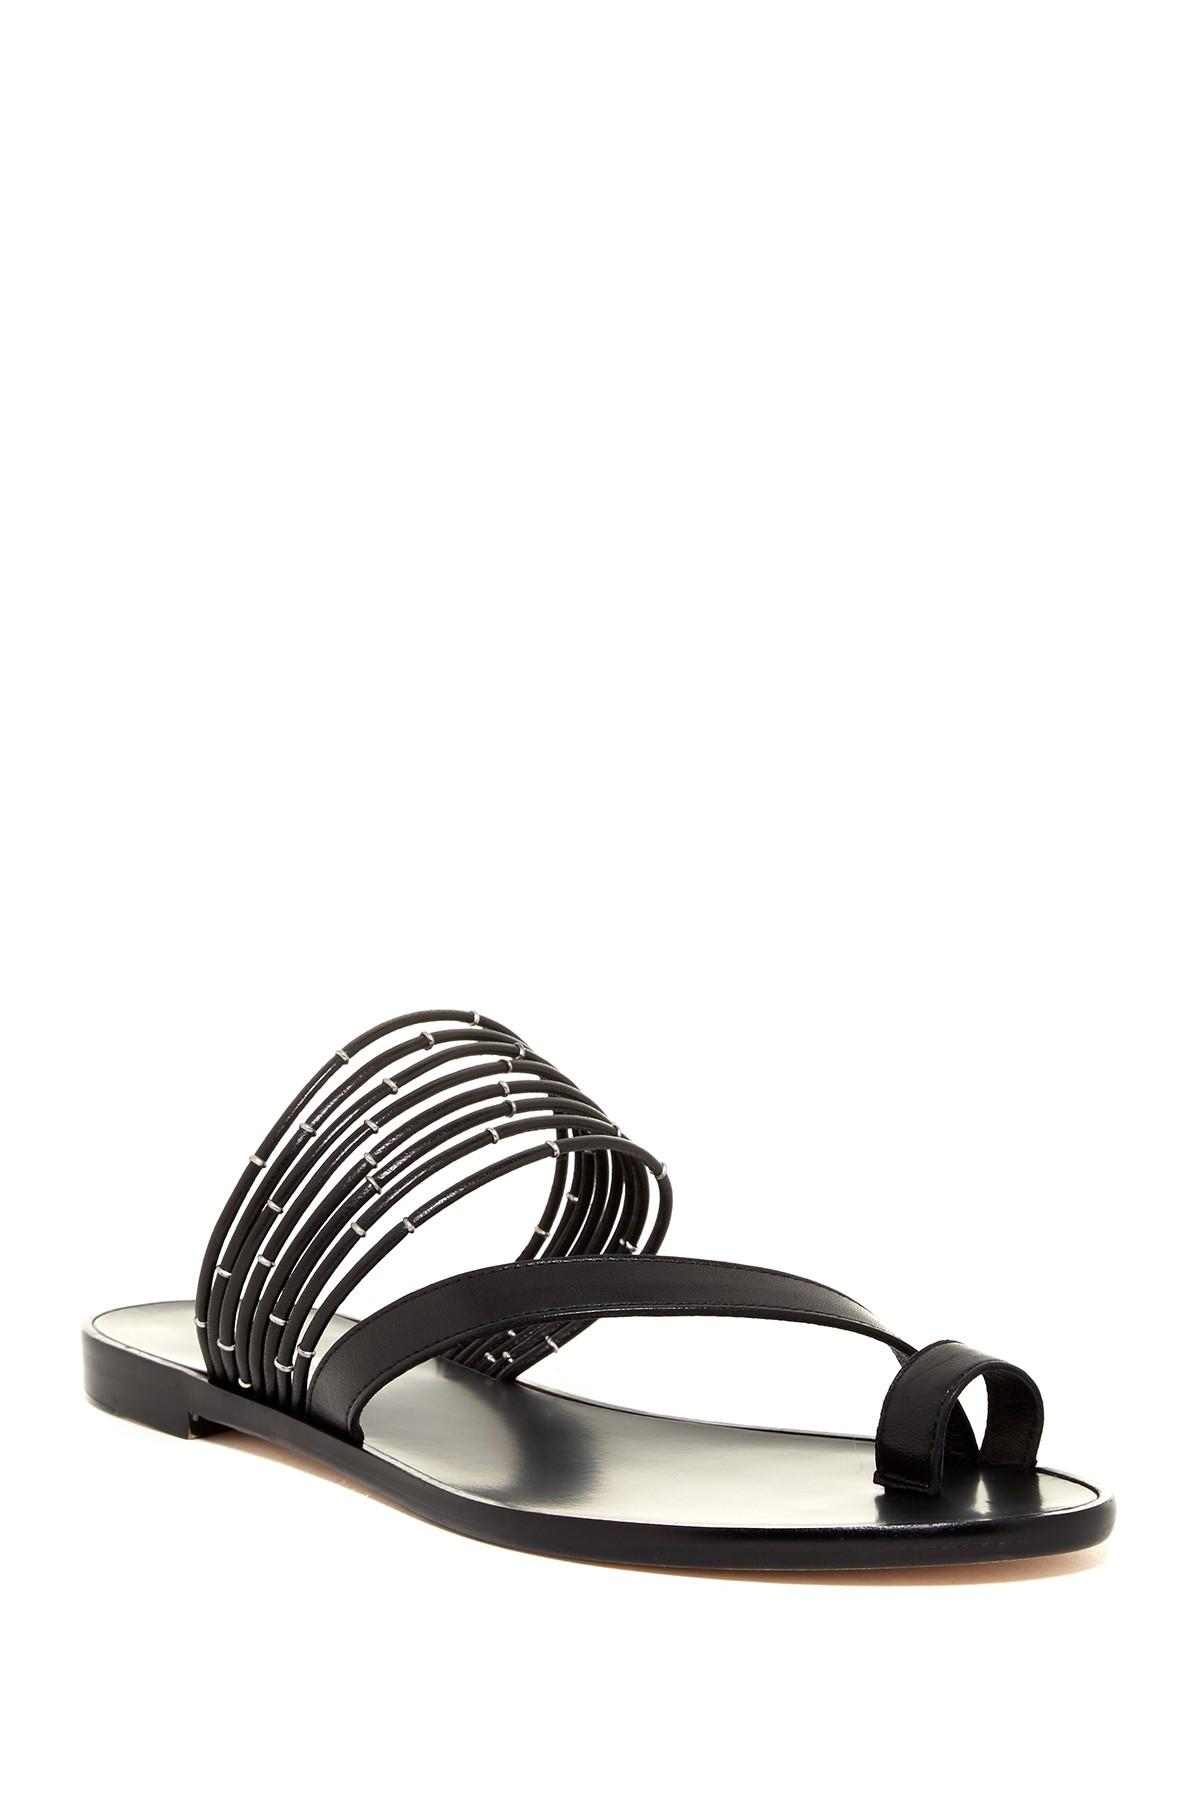 Pour-La-Victoire-Lara-Elastic-Strap-Open-Toe-Vamp-Black-Leather-Sandal-size-5-5